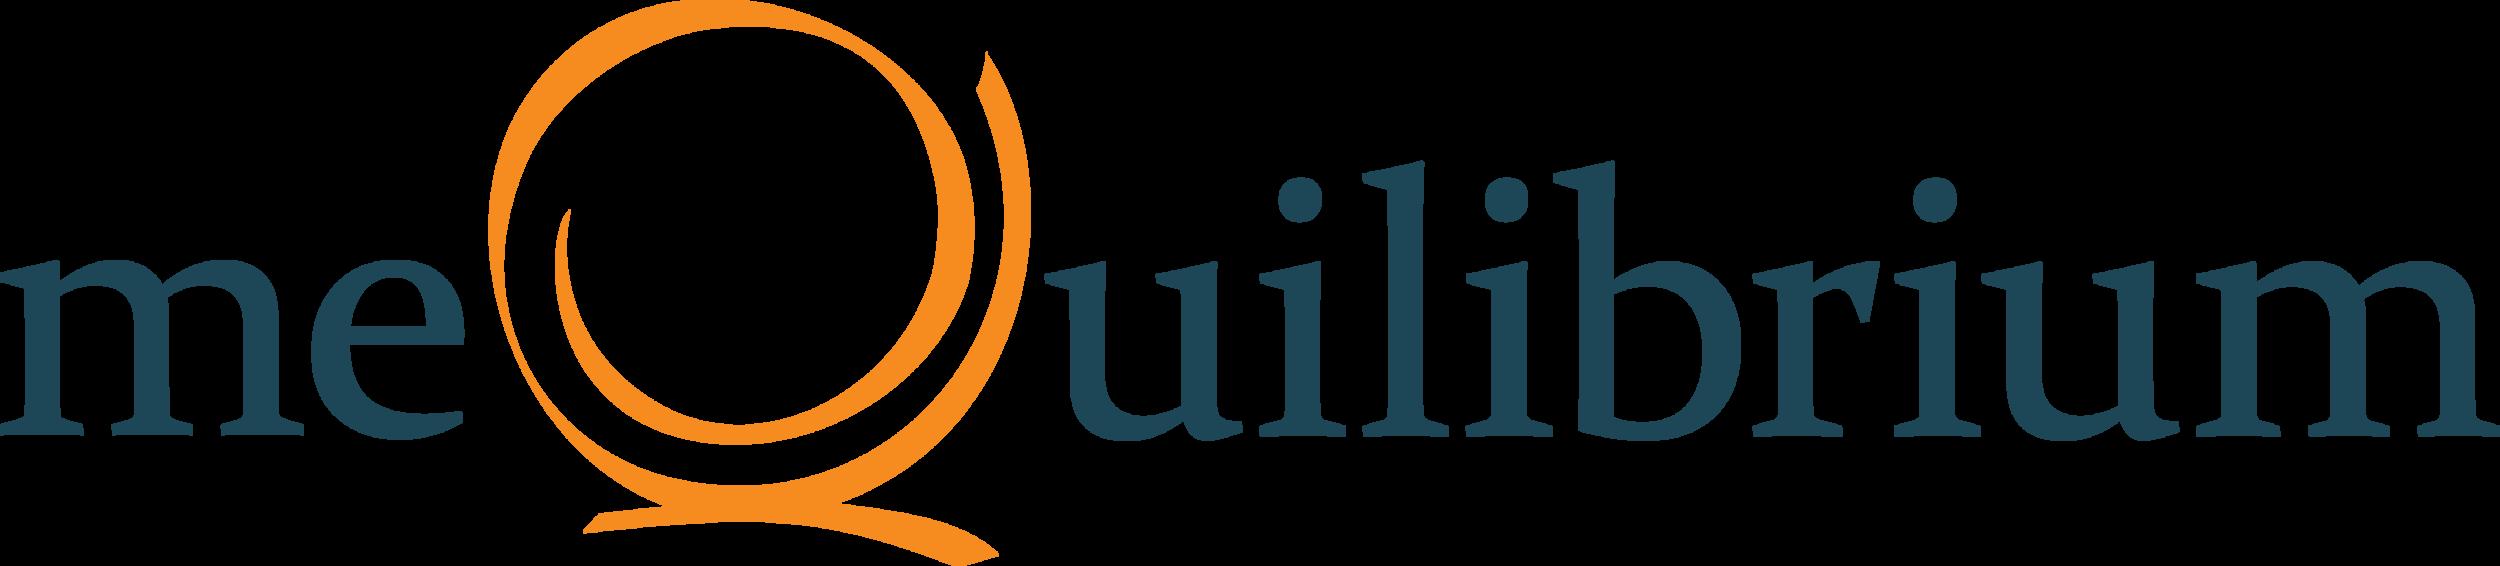 meQuilibrium-logo-standard.png